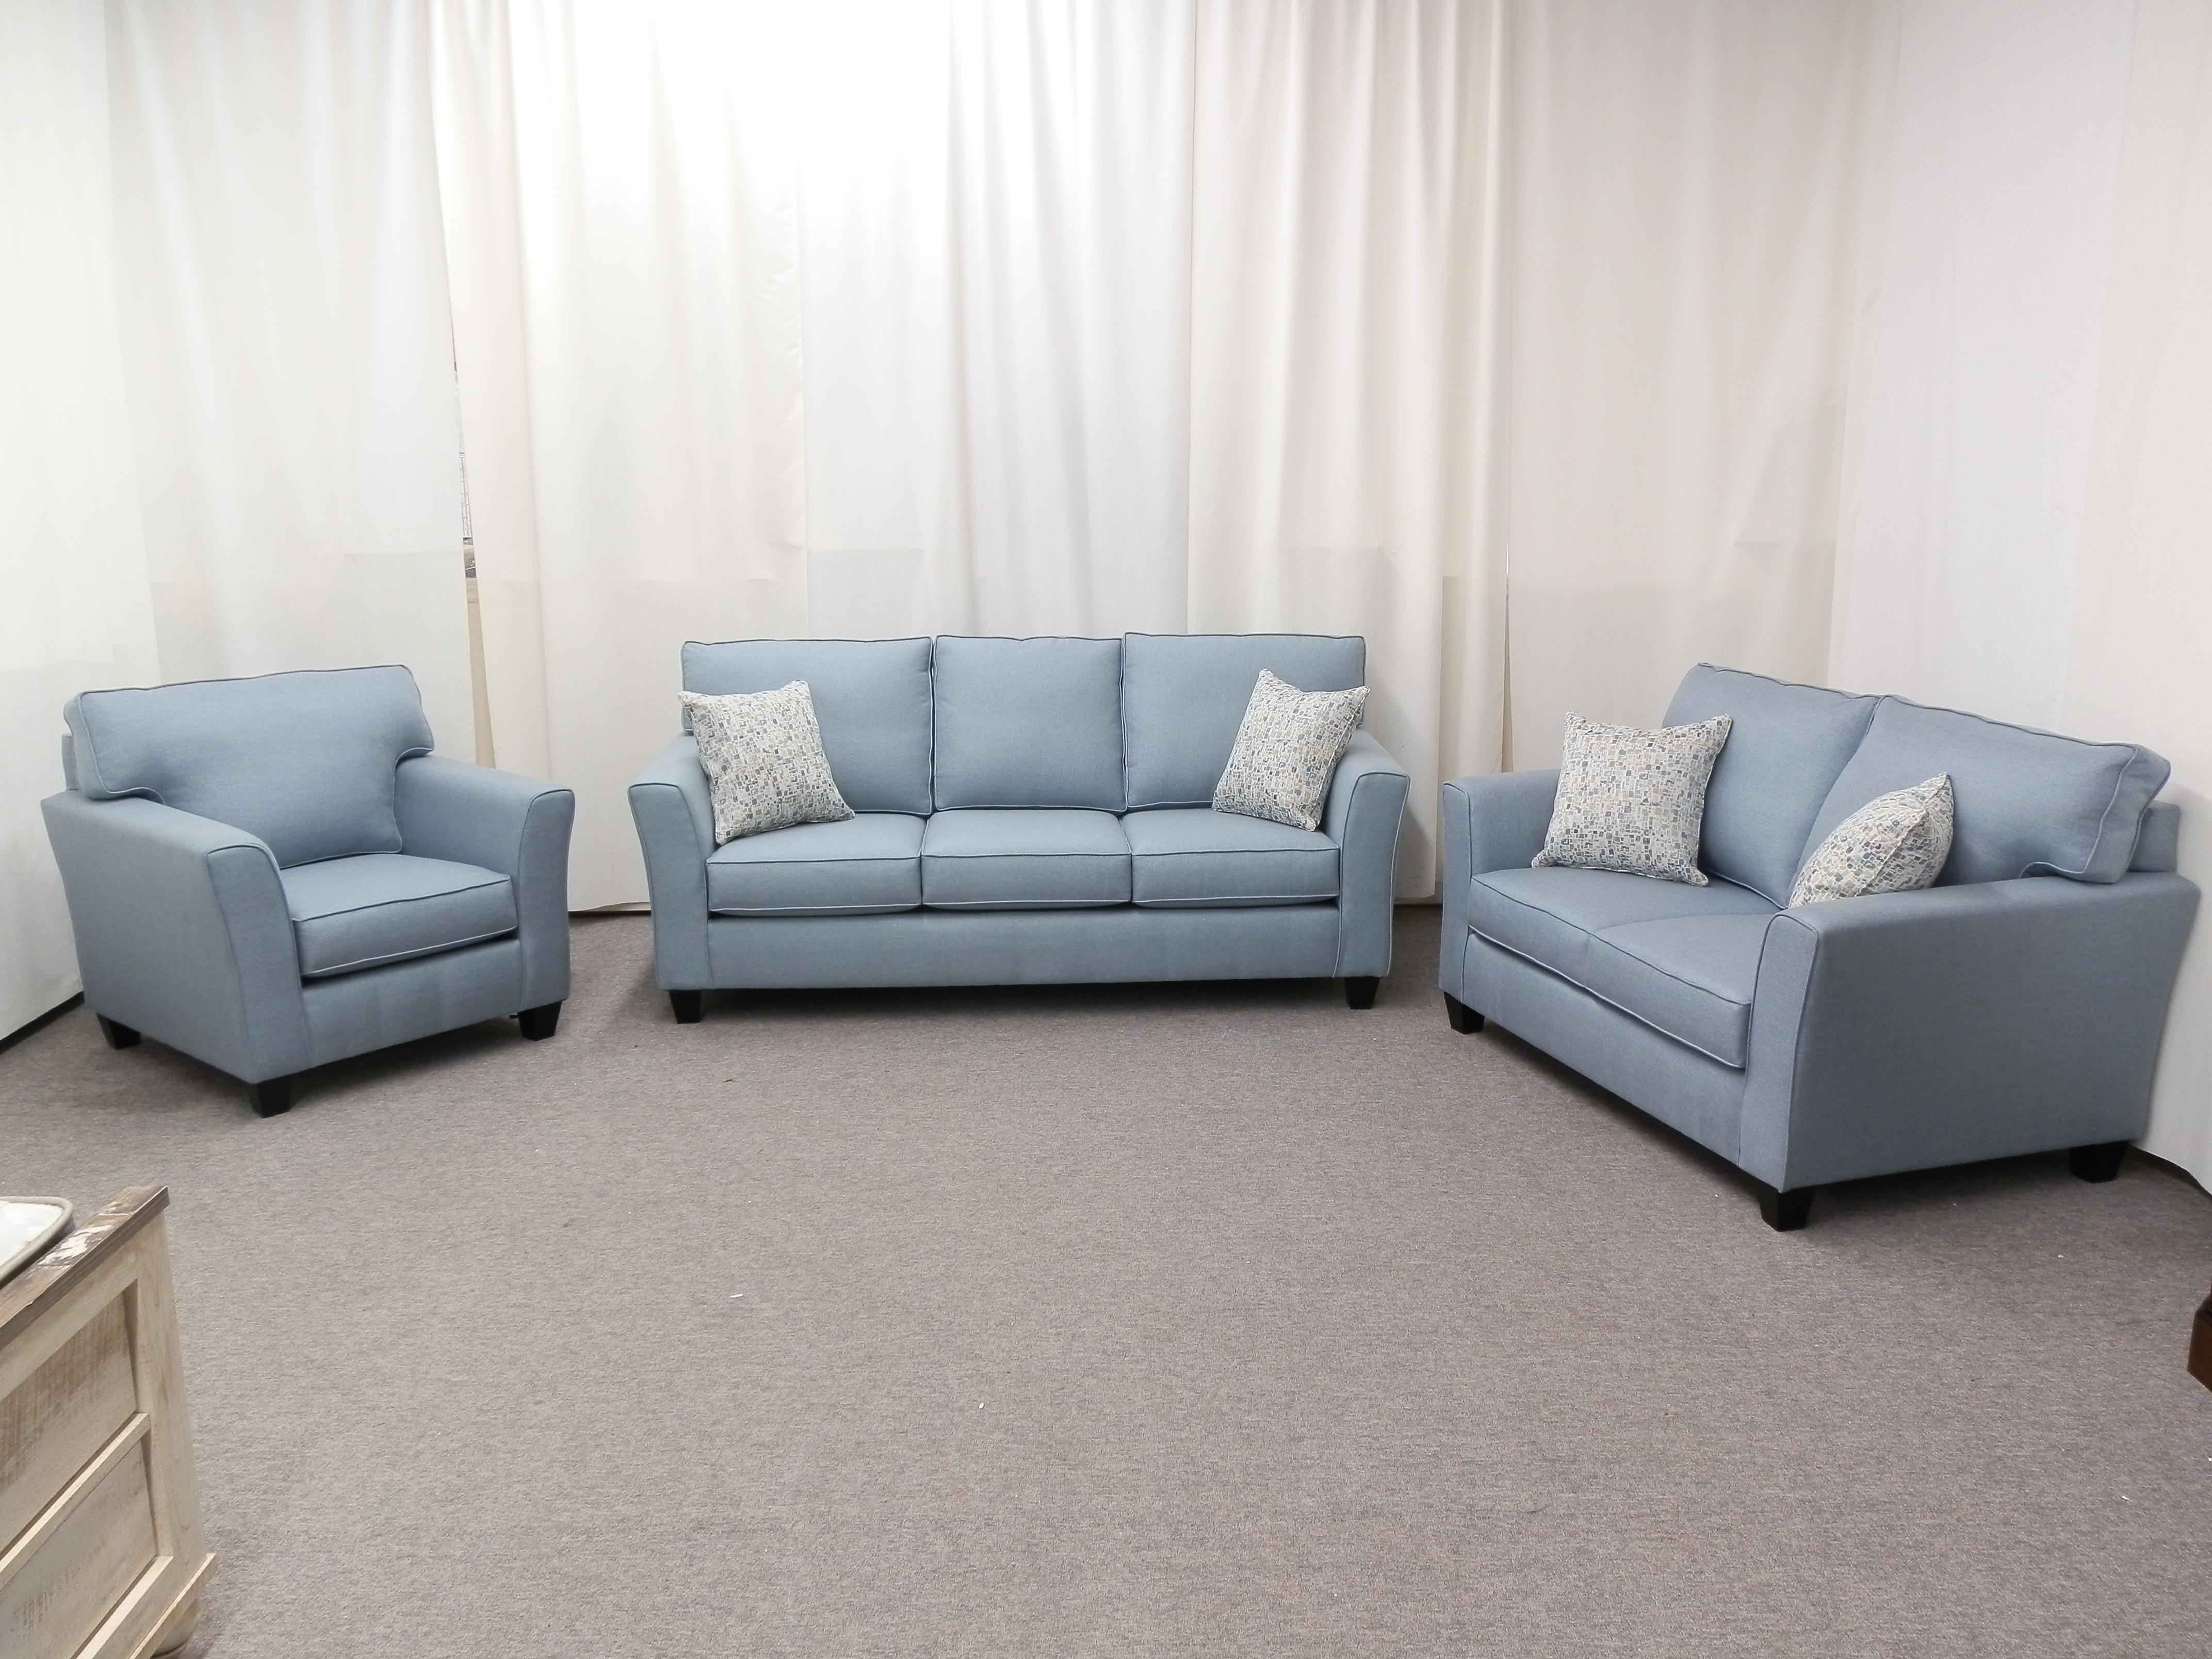 23616 – Sofa Set – AU-2550